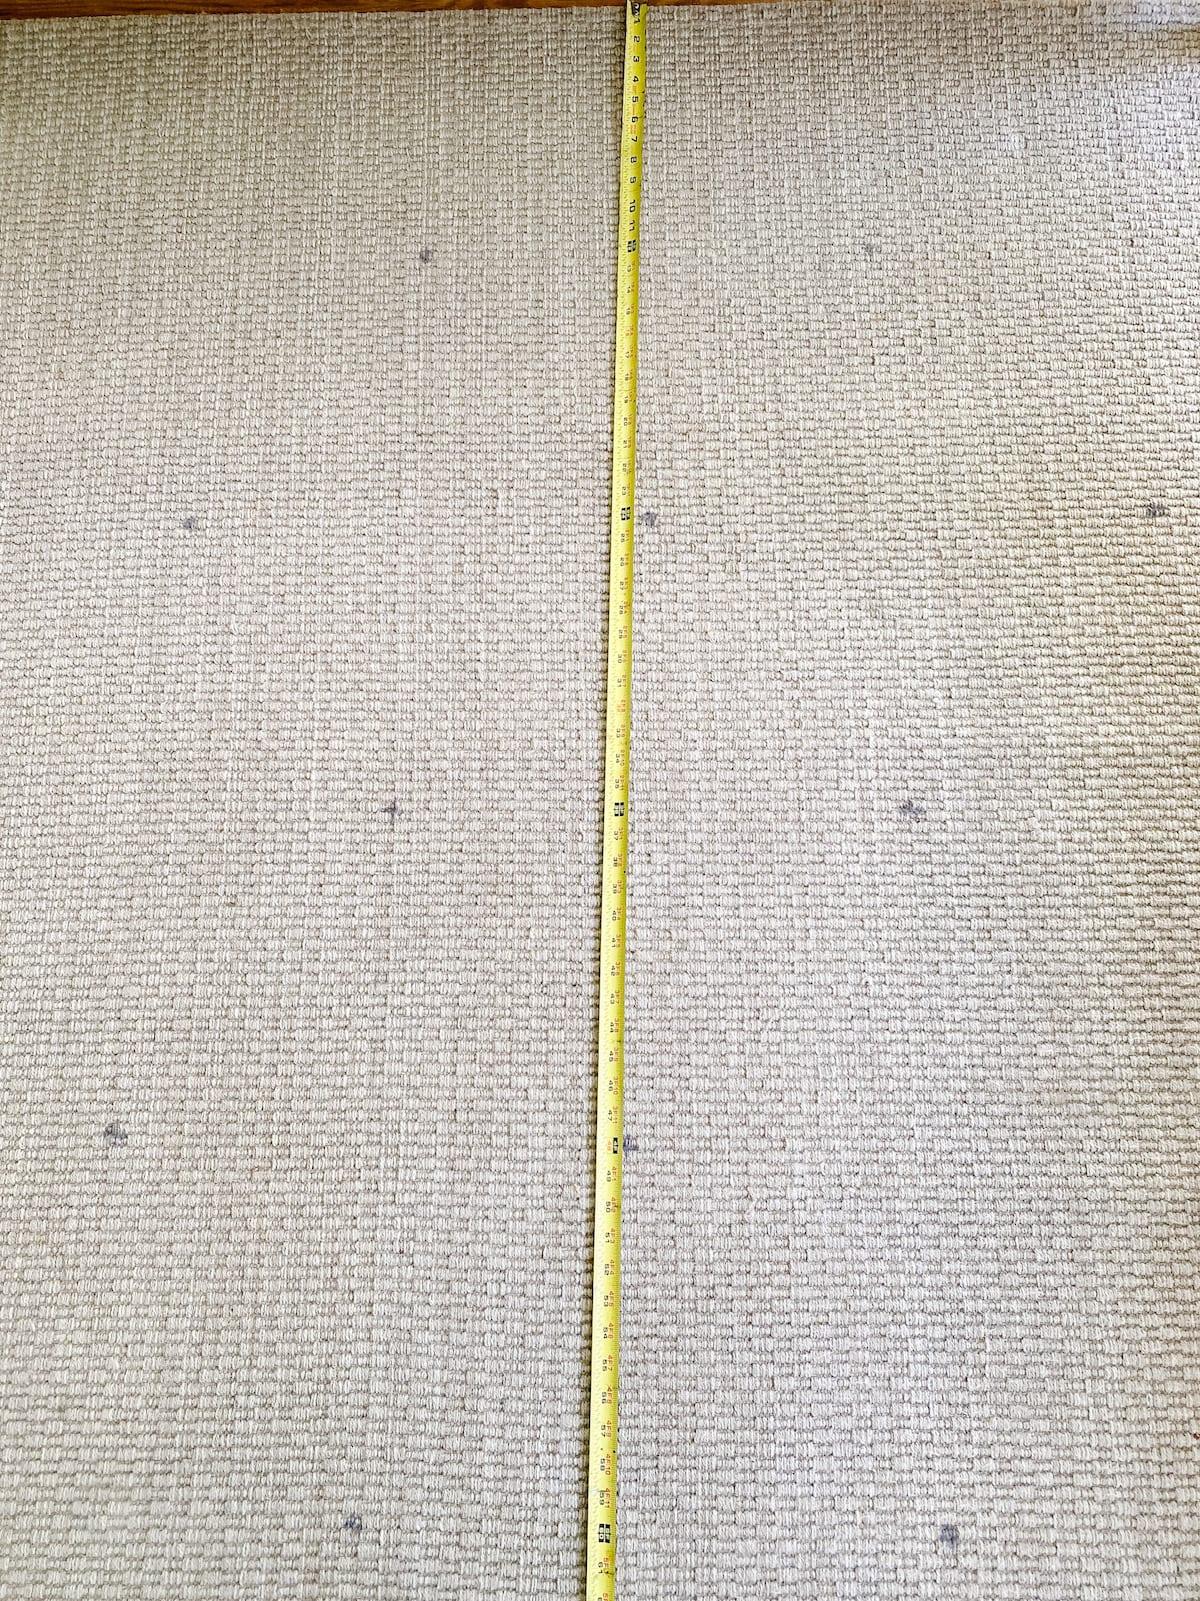 measuring for a floral block rug pattern